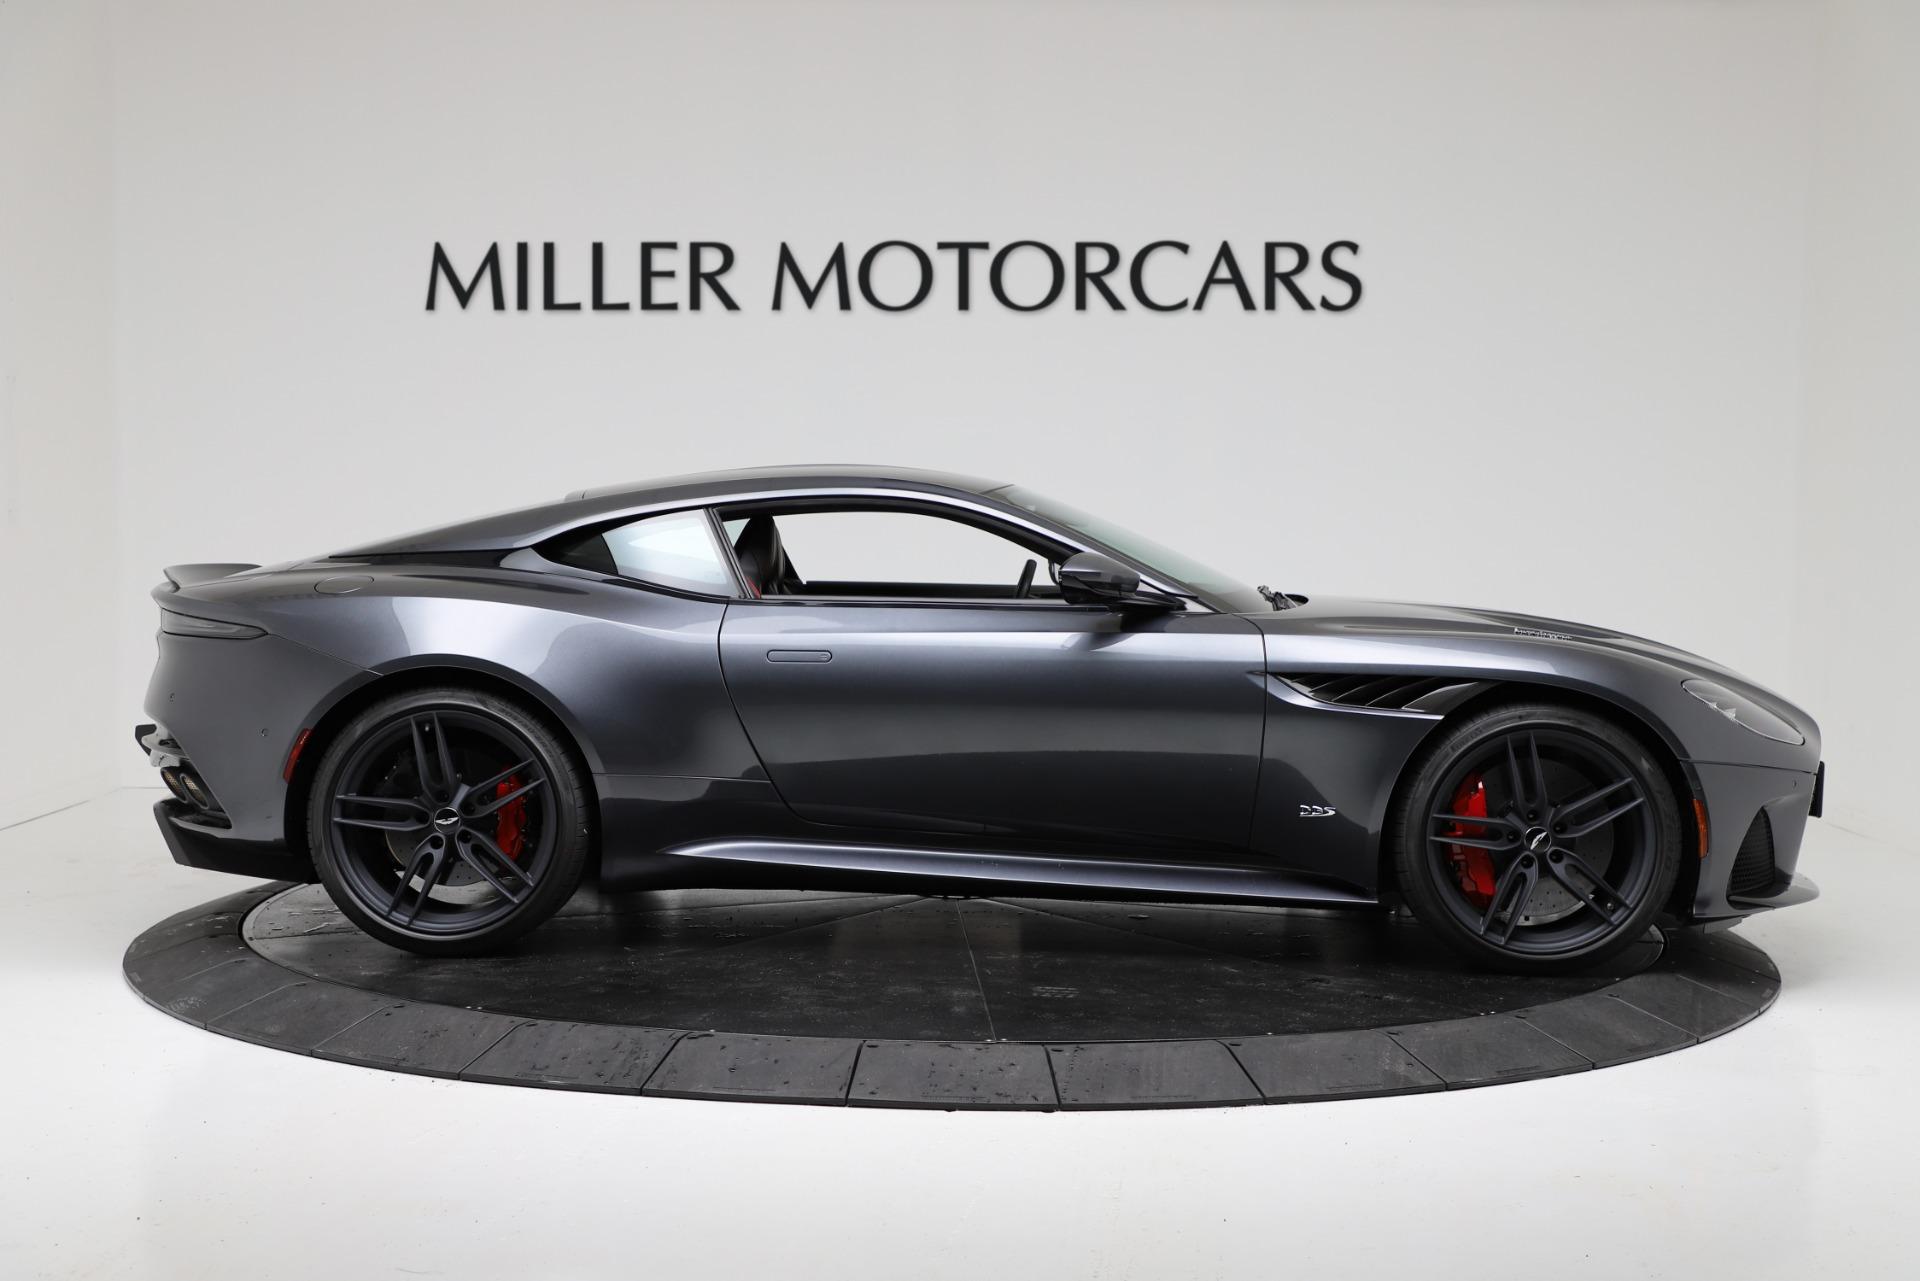 New-2019-Aston-Martin-DBS-Superleggera-Coupe